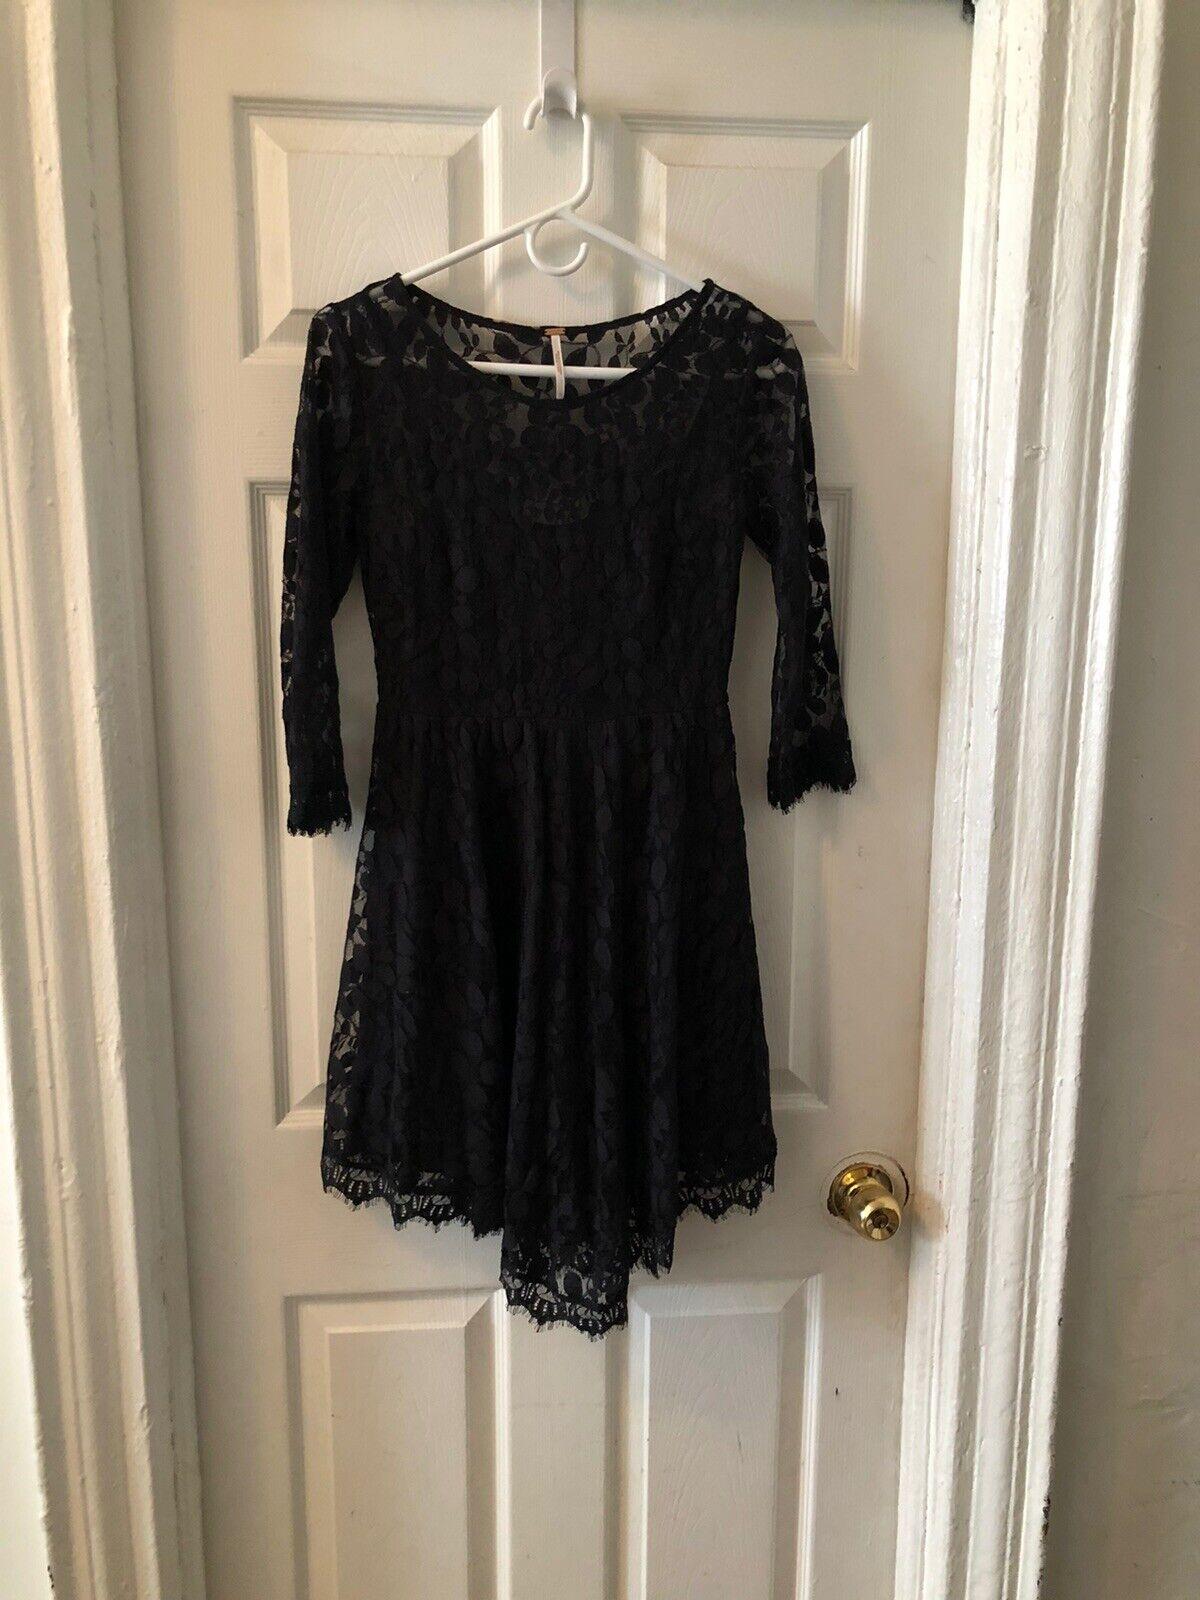 Free People Black Dress - image 4